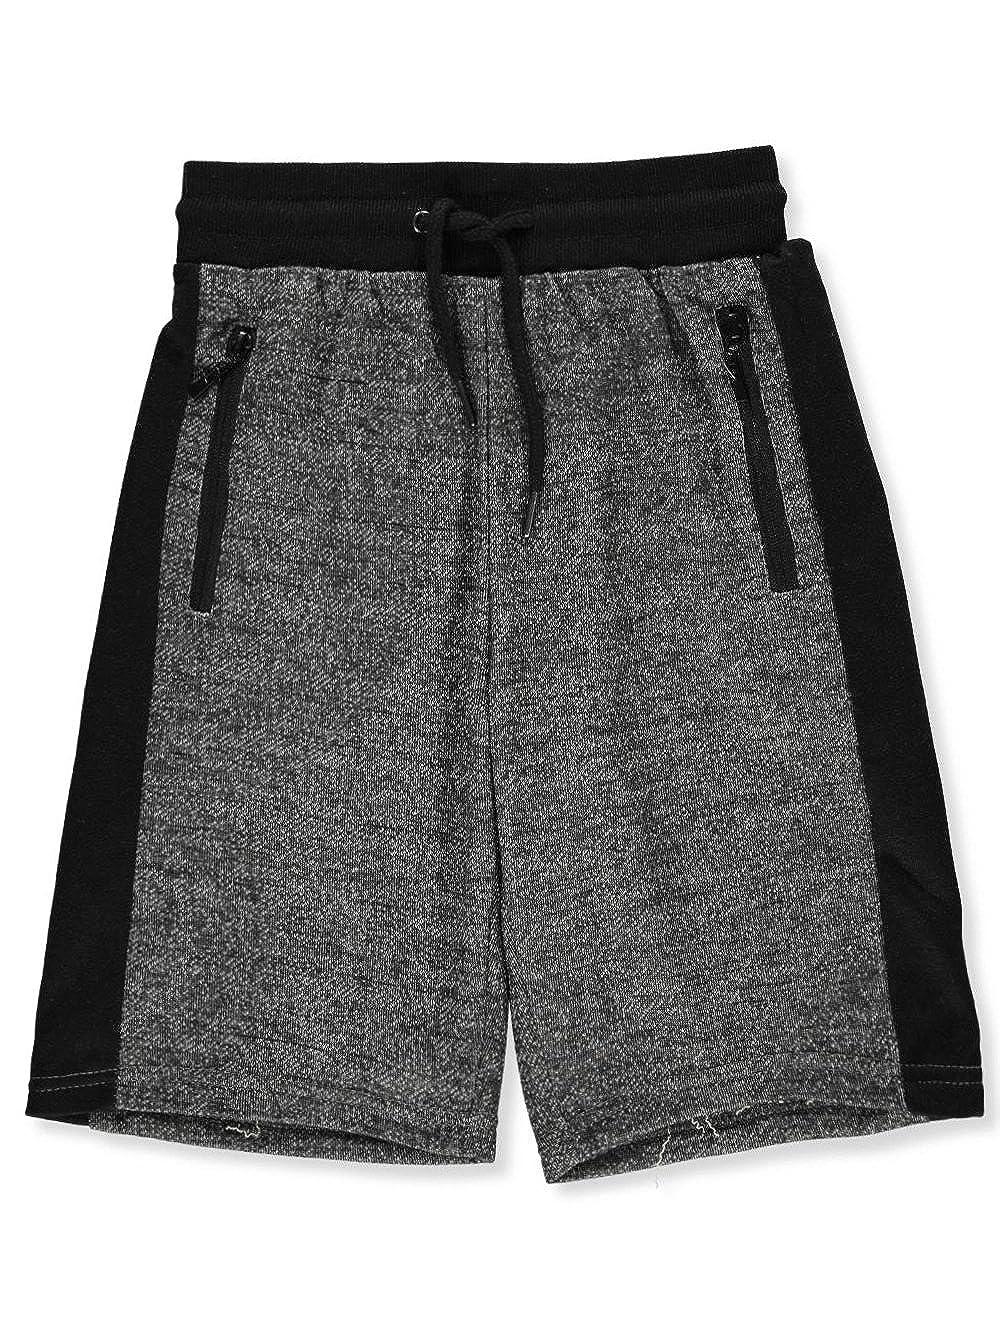 Galaxy by Harvic Boys' Shorts 10-12 Galaxy School Uniforms